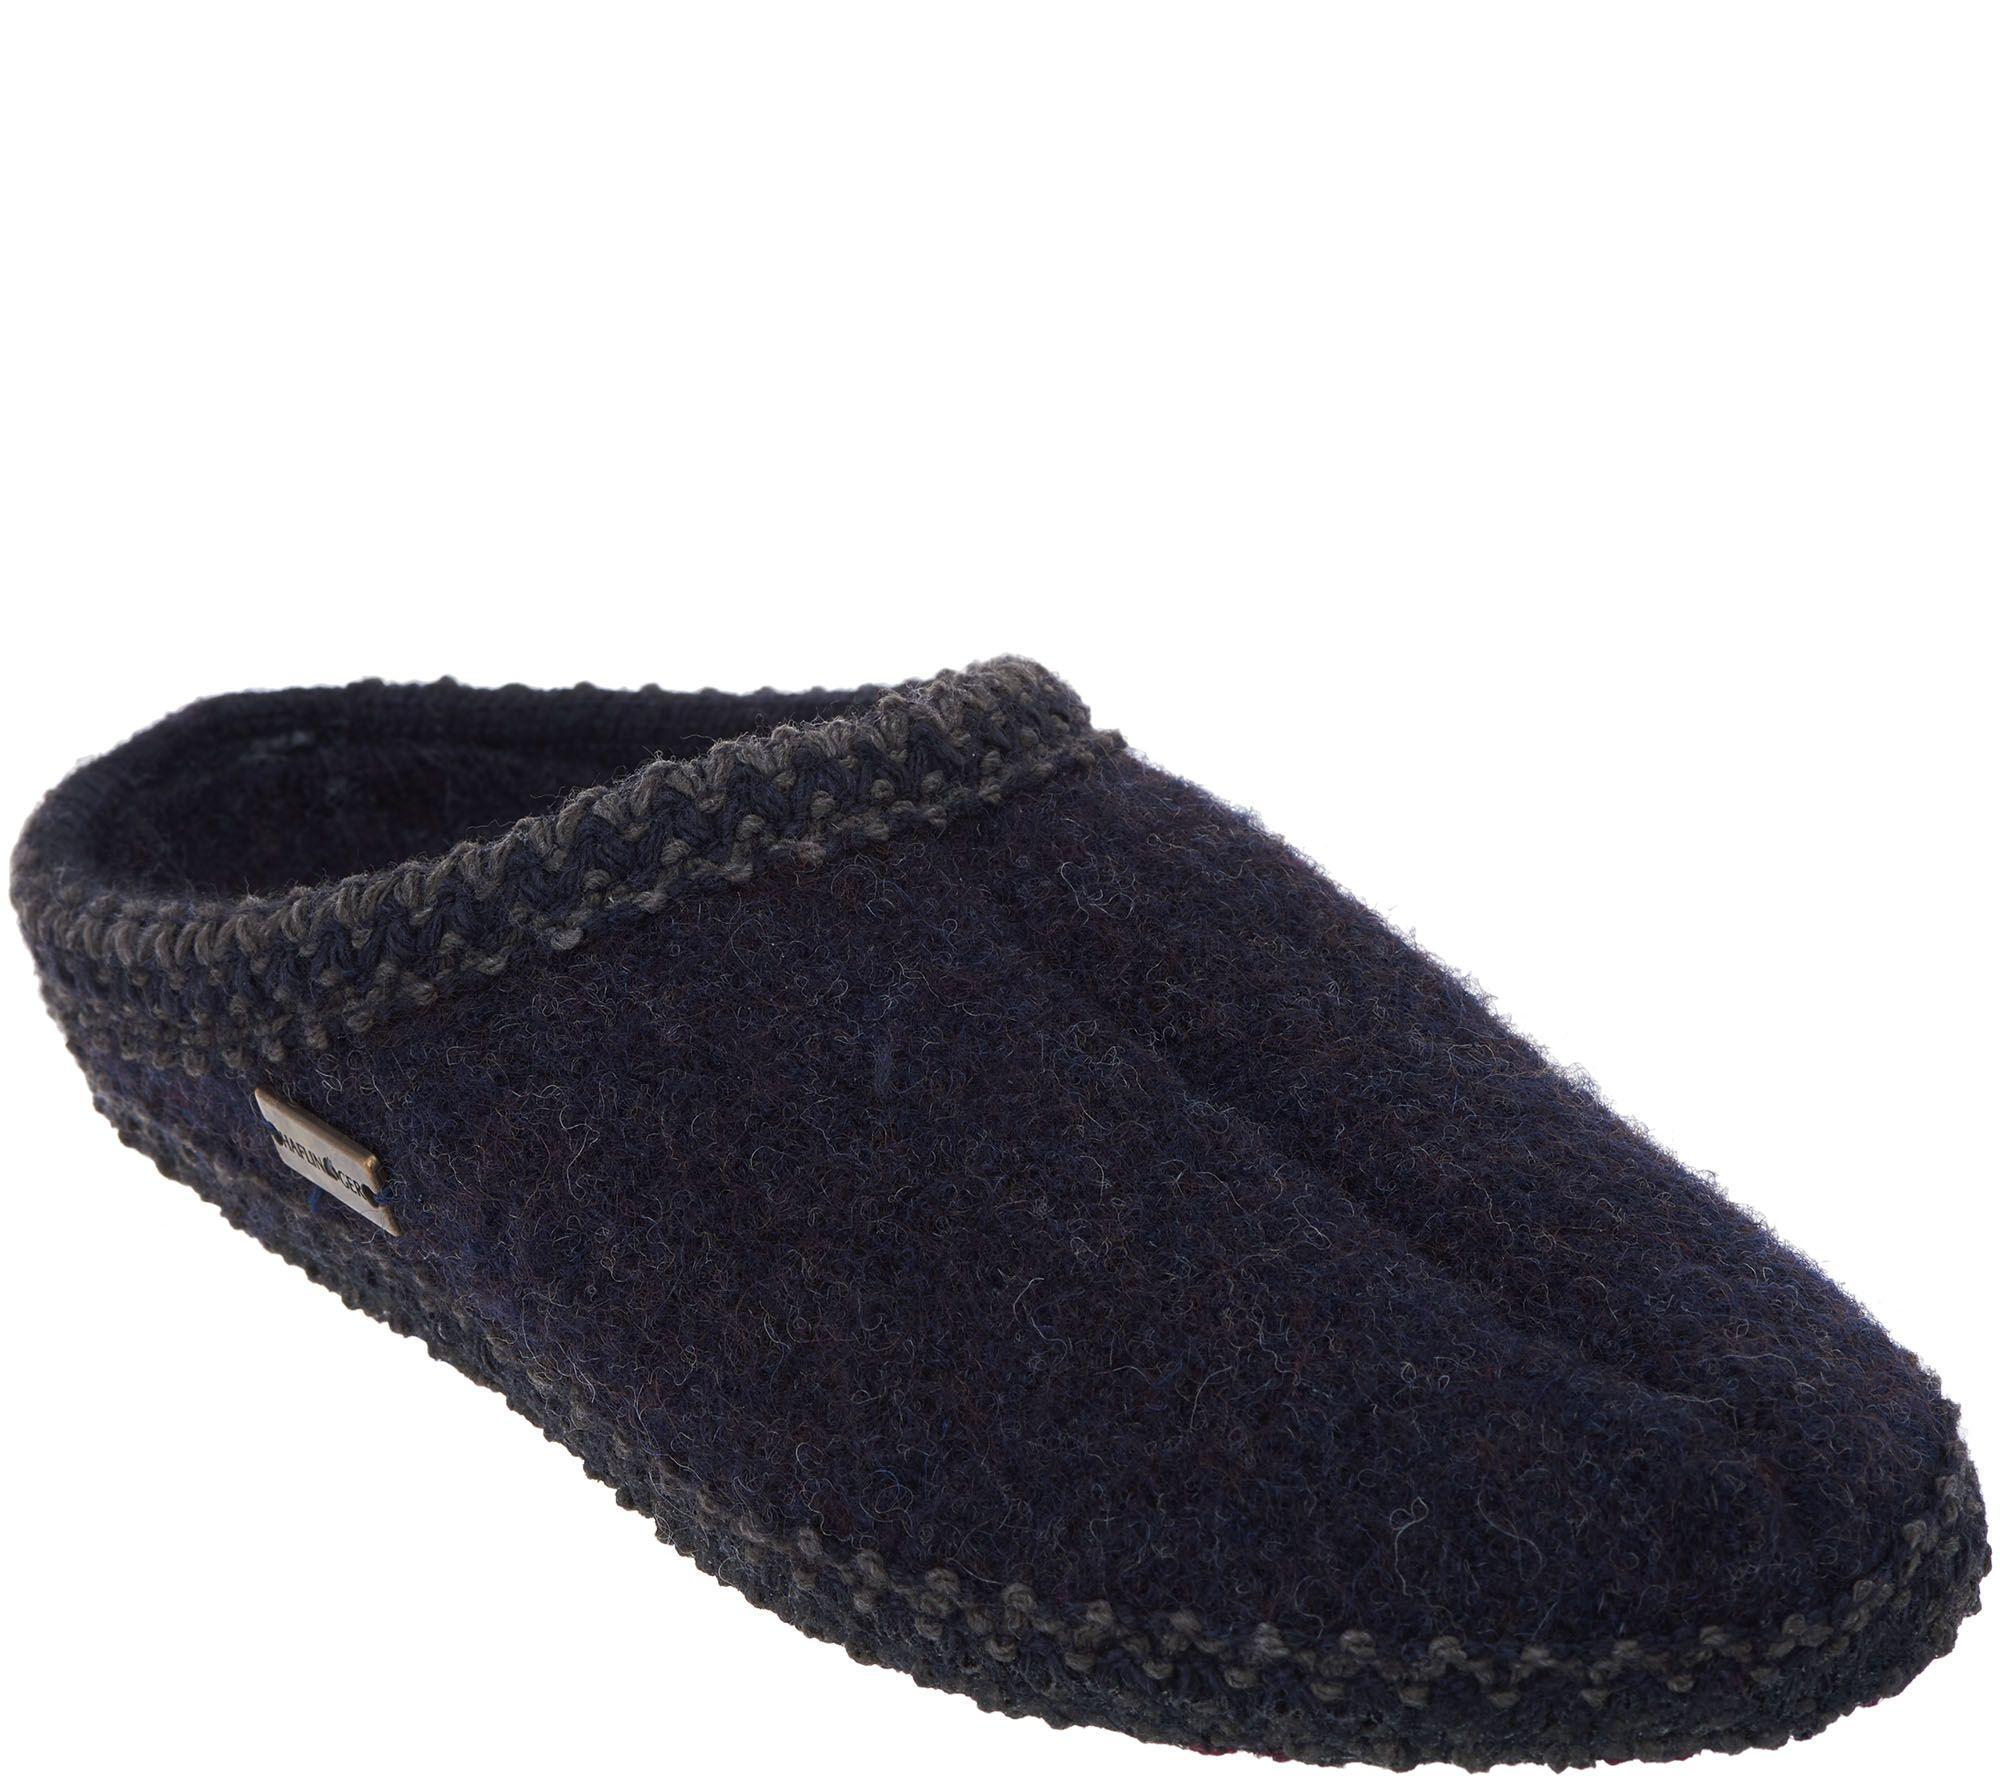 Mens La-bron-King-Player Non-Slip Beach Slippers Soft Foams Slippers